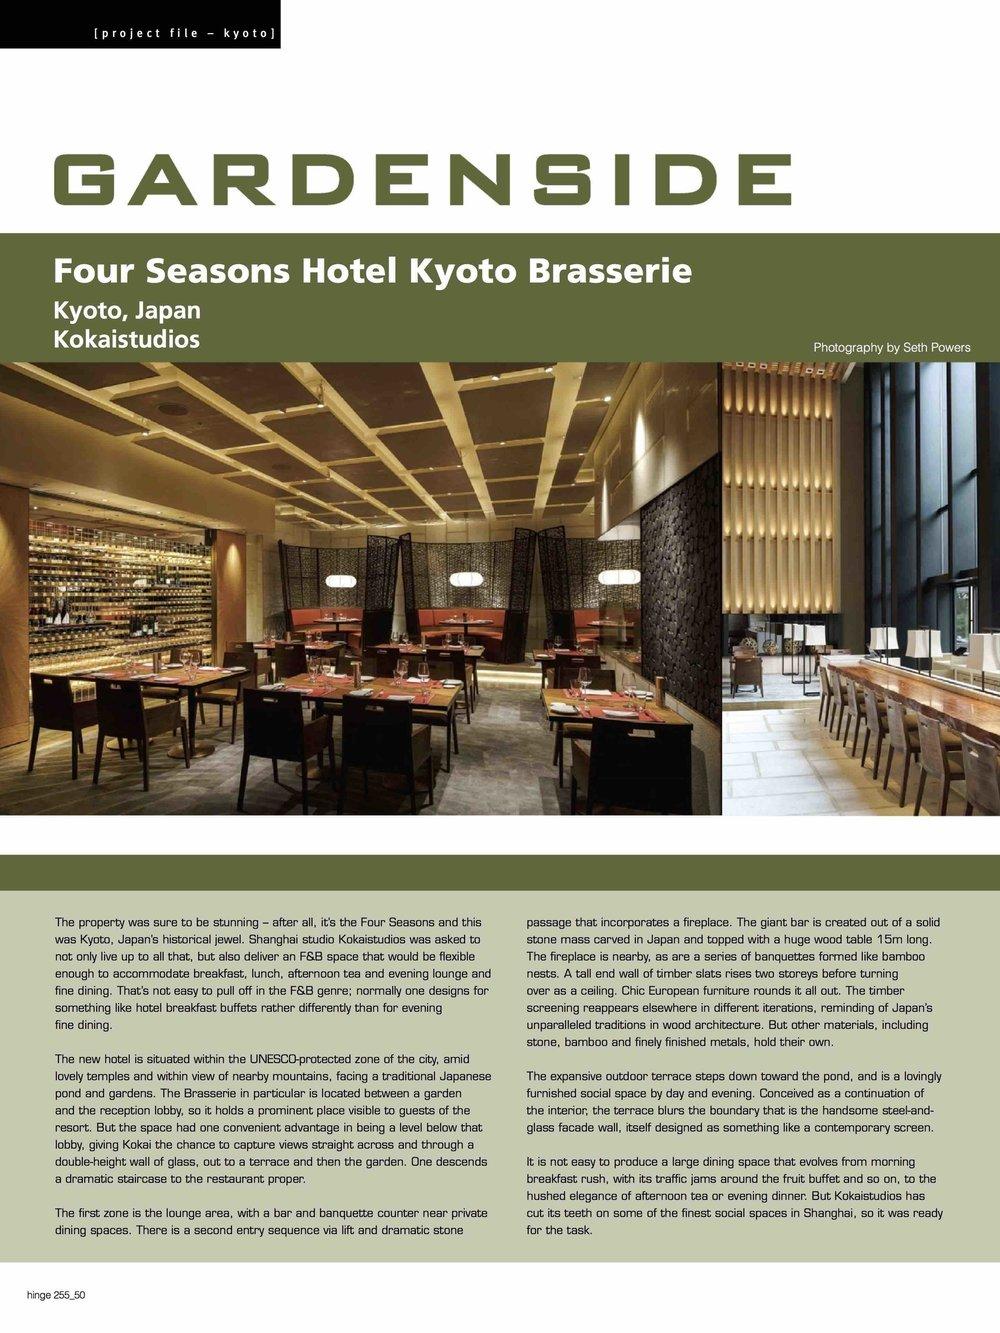 Hinge | May 2017 - Brasserie at Four Seasons Hotel Kyoto |Kokaistudios